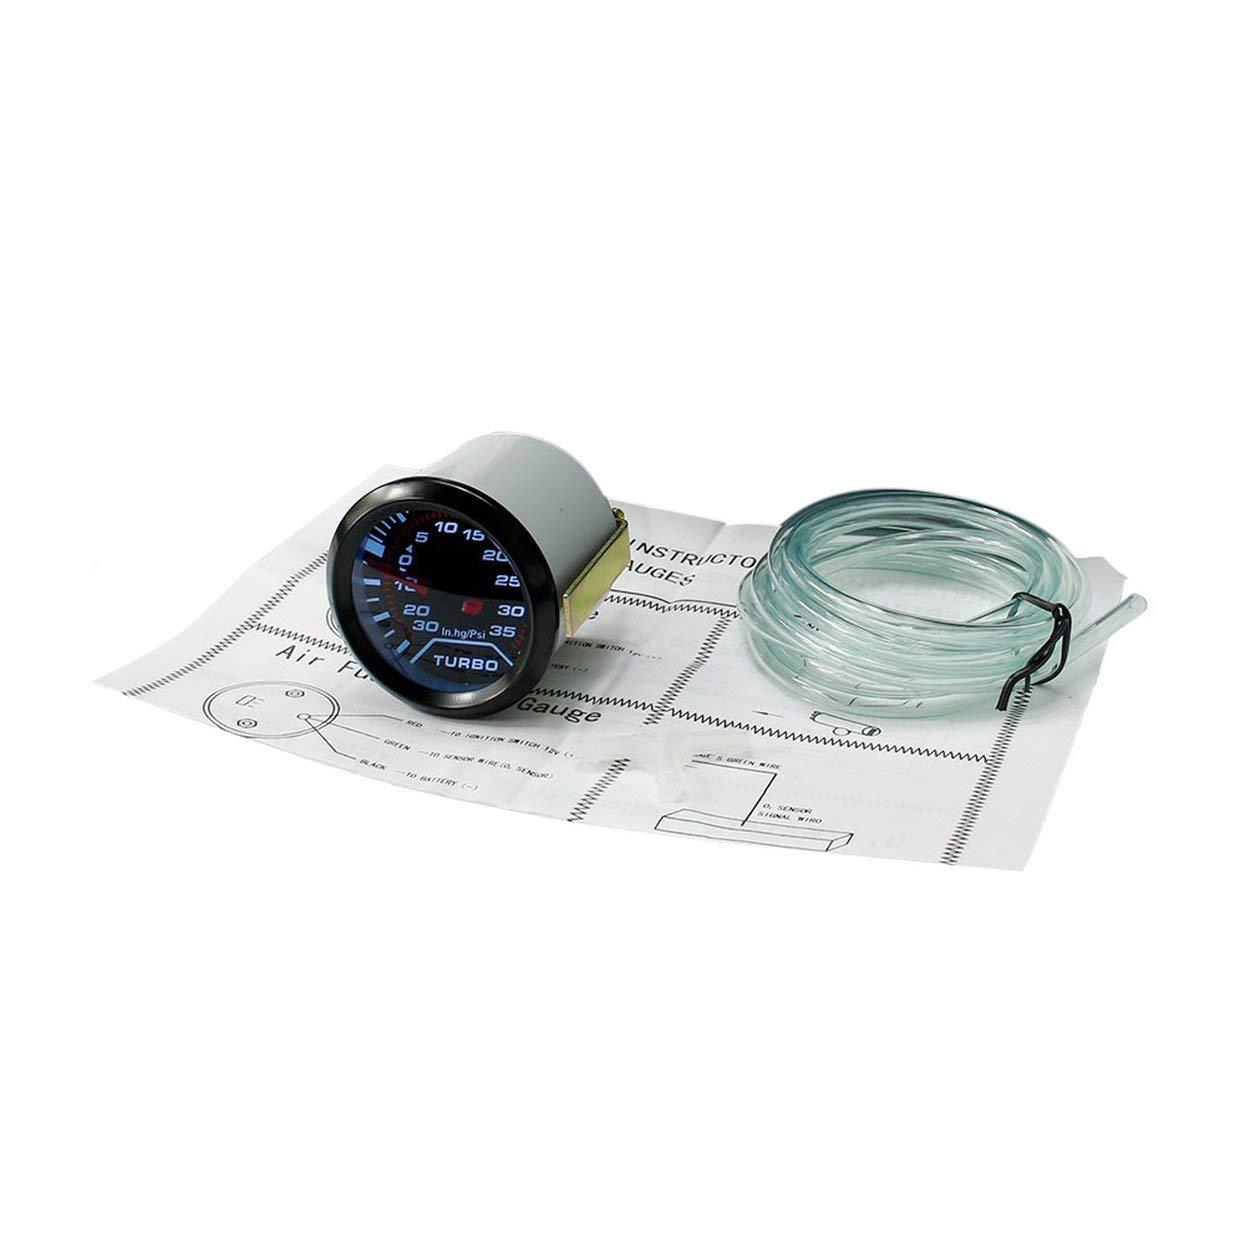 CNSPEED - Medidor digital de potencia turbo para coche (12 V ...